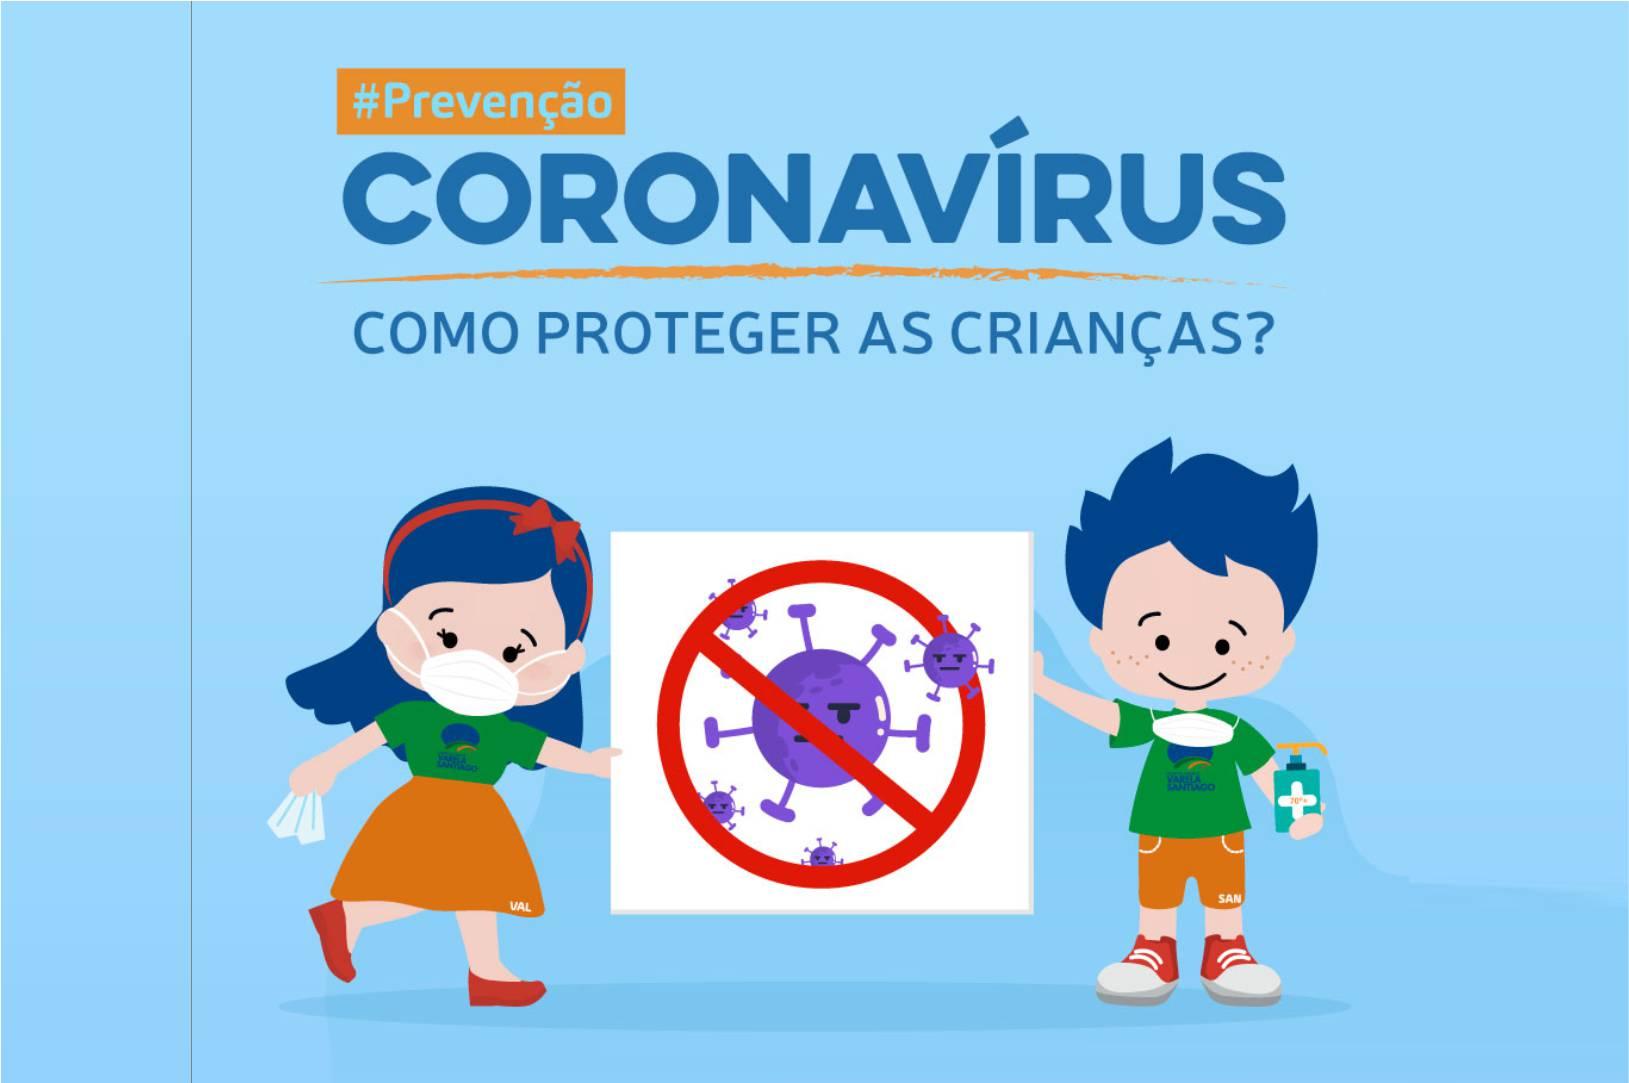 Coronavirus Como proteger as criancas